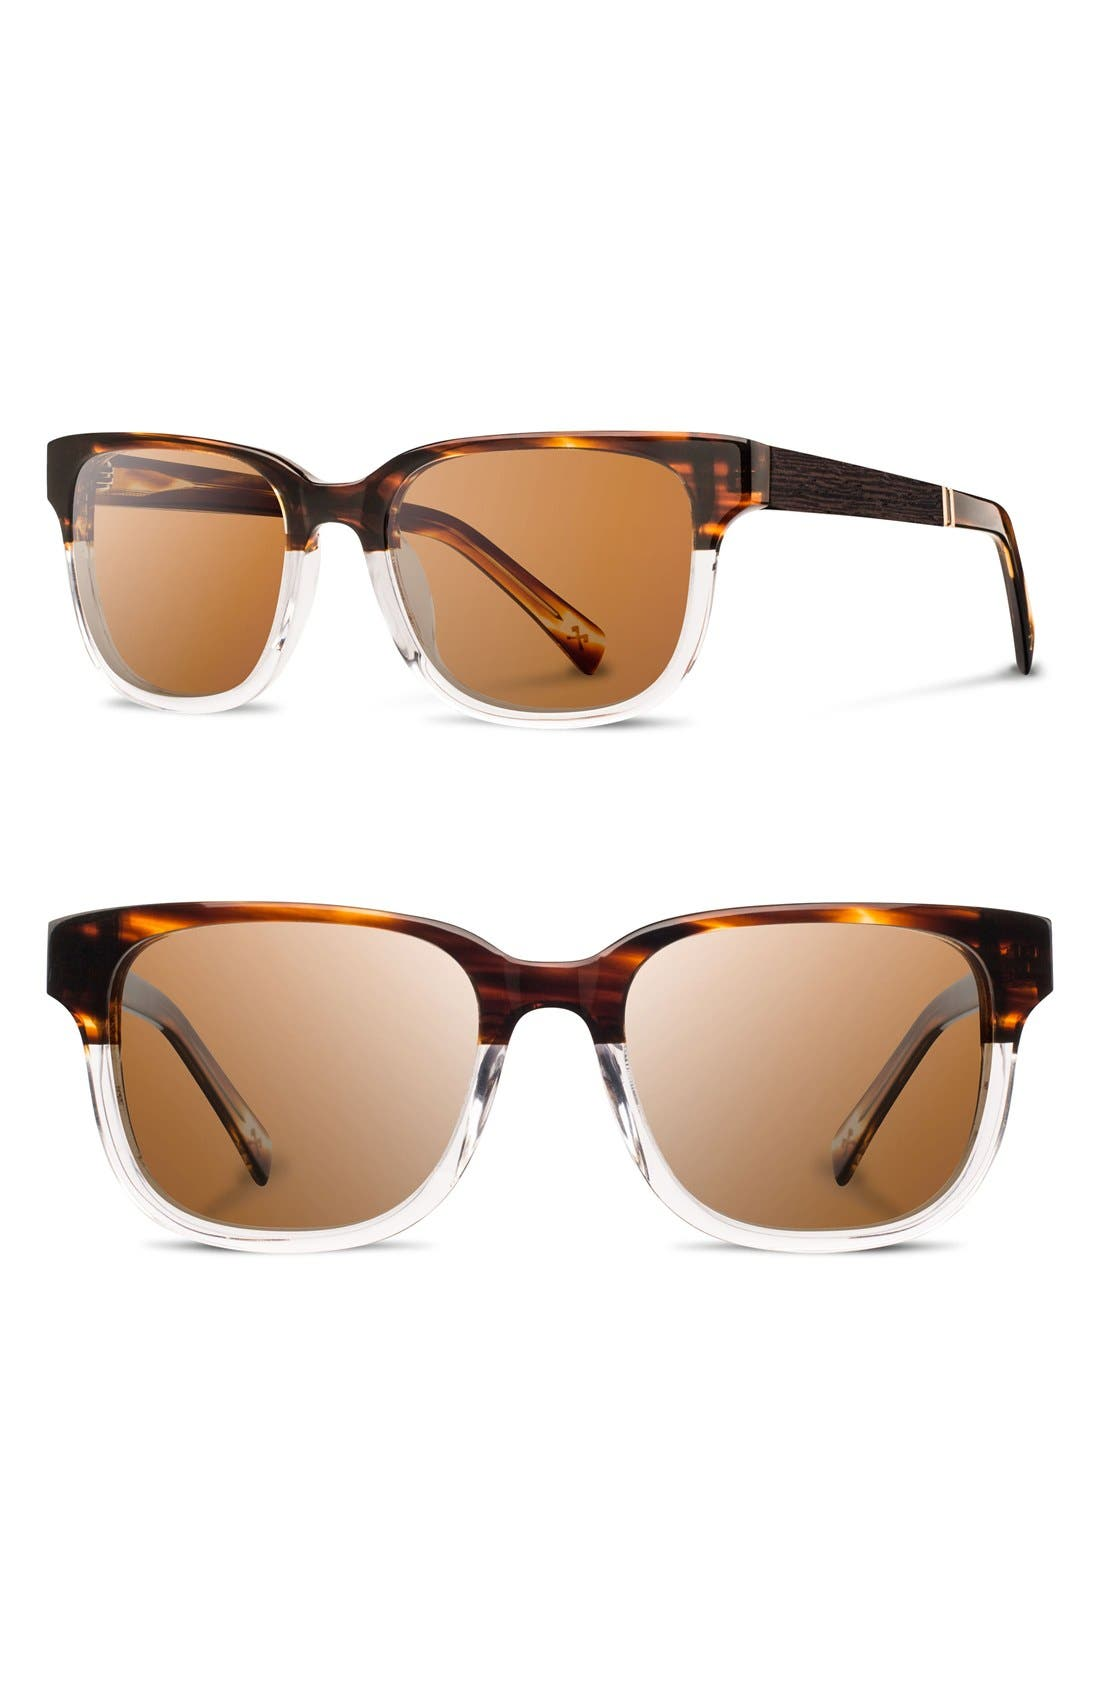 Alternate Image 1 Selected - Shwood 'Prescott' 52mm Acetate & Wood Sunglasses